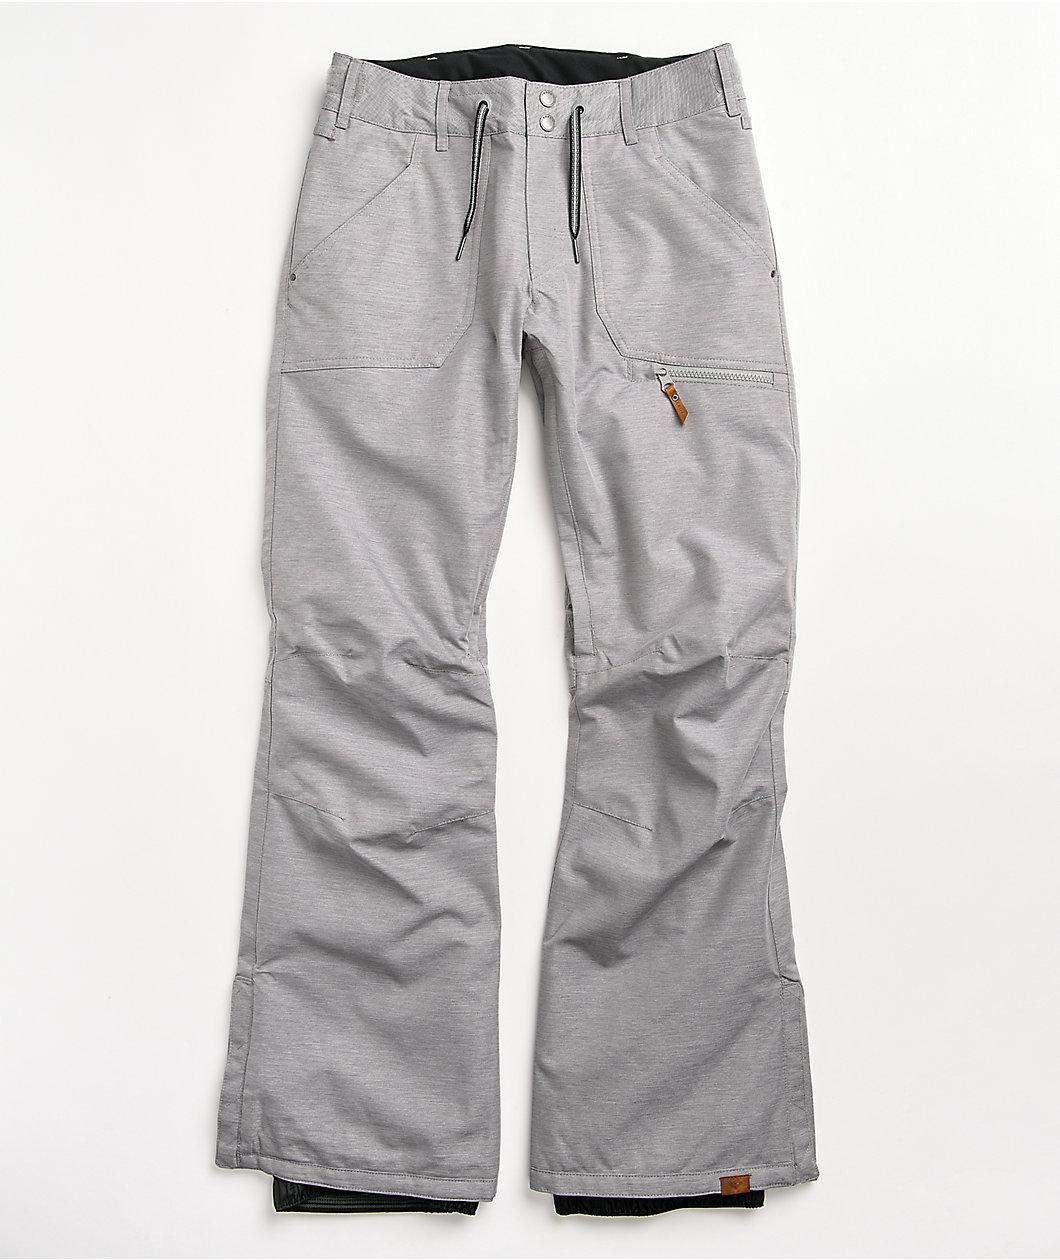 Roxy Nadia Heather Grey 10K Snowboard Pants